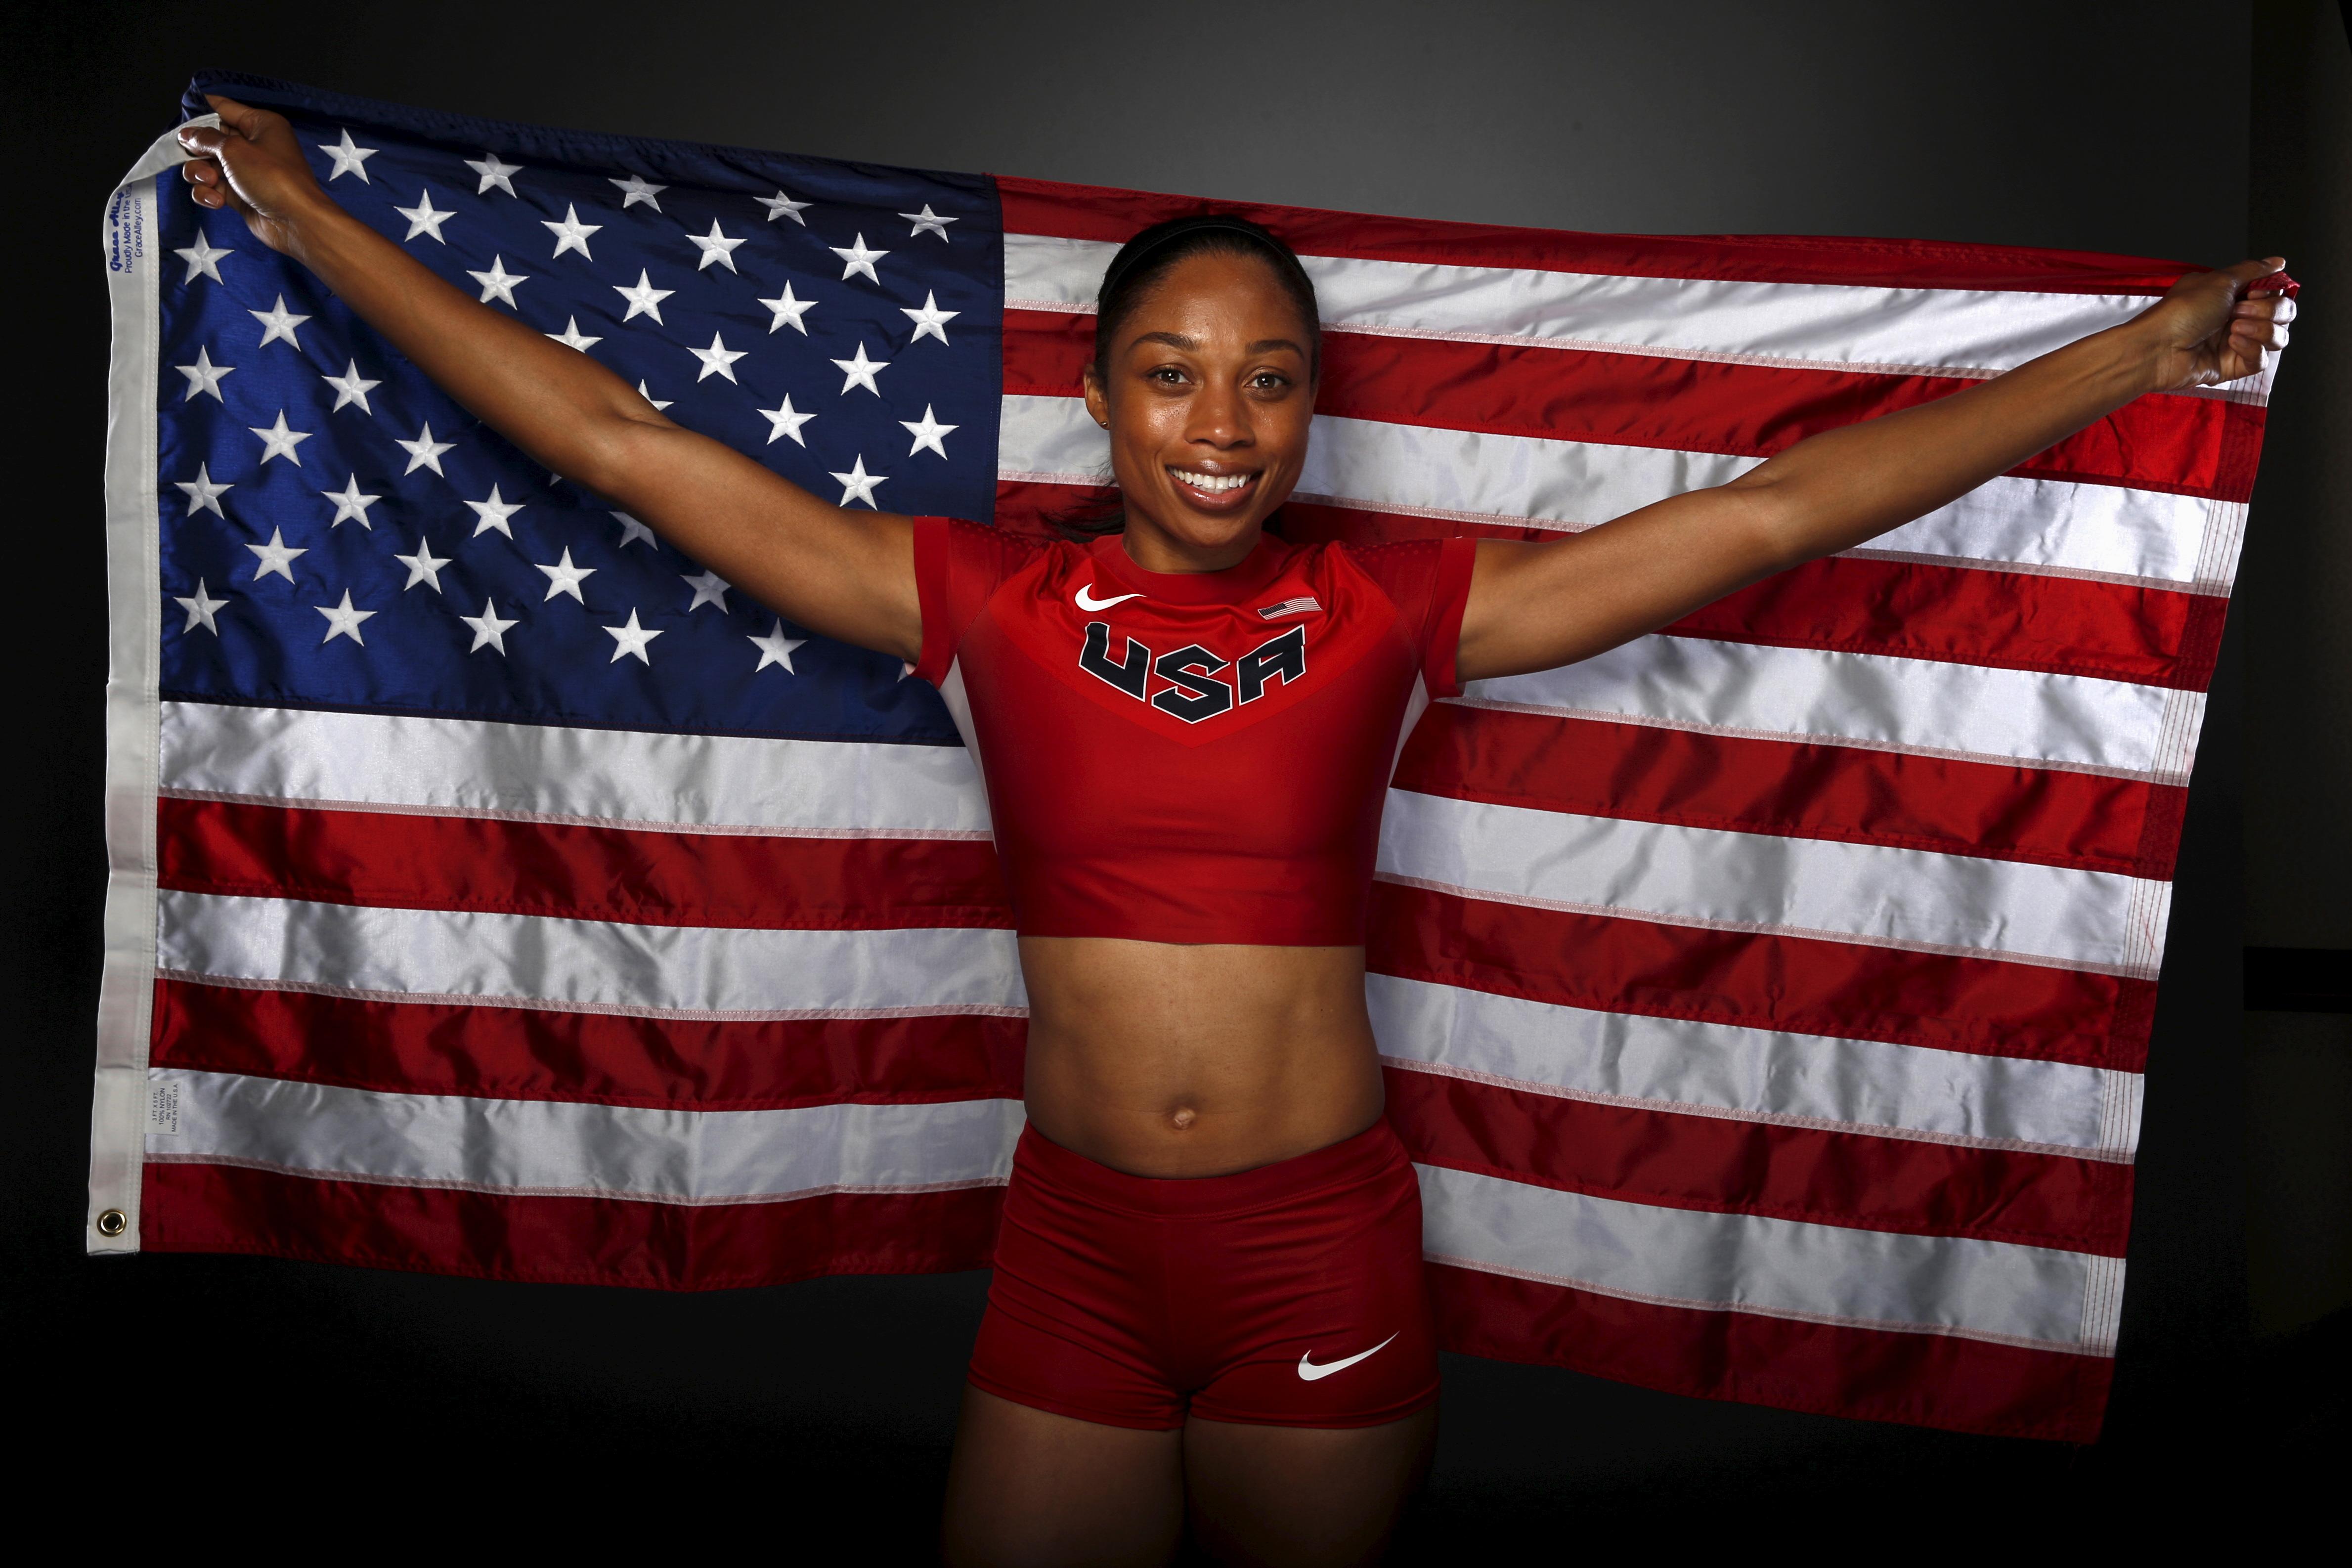 OLYMPICS-USA/